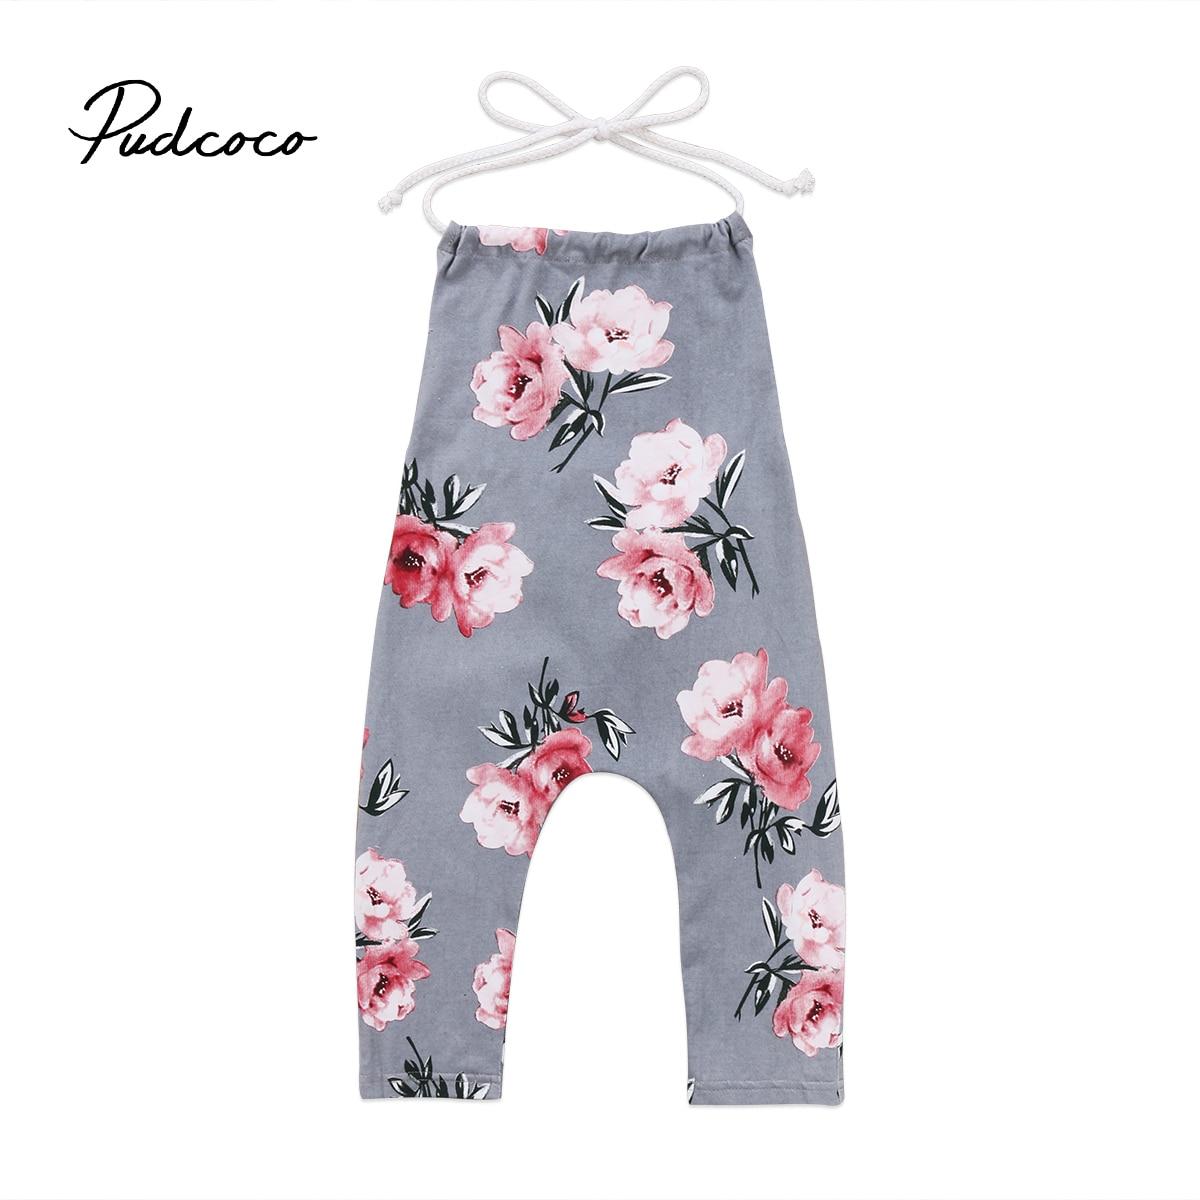 2018 Brand New Sleeveless Toddler Infant Child Kids Baby Kids Girl Flower Halter   Romper   Jumpsuit Playsuit Strap Clothes 6M-6T